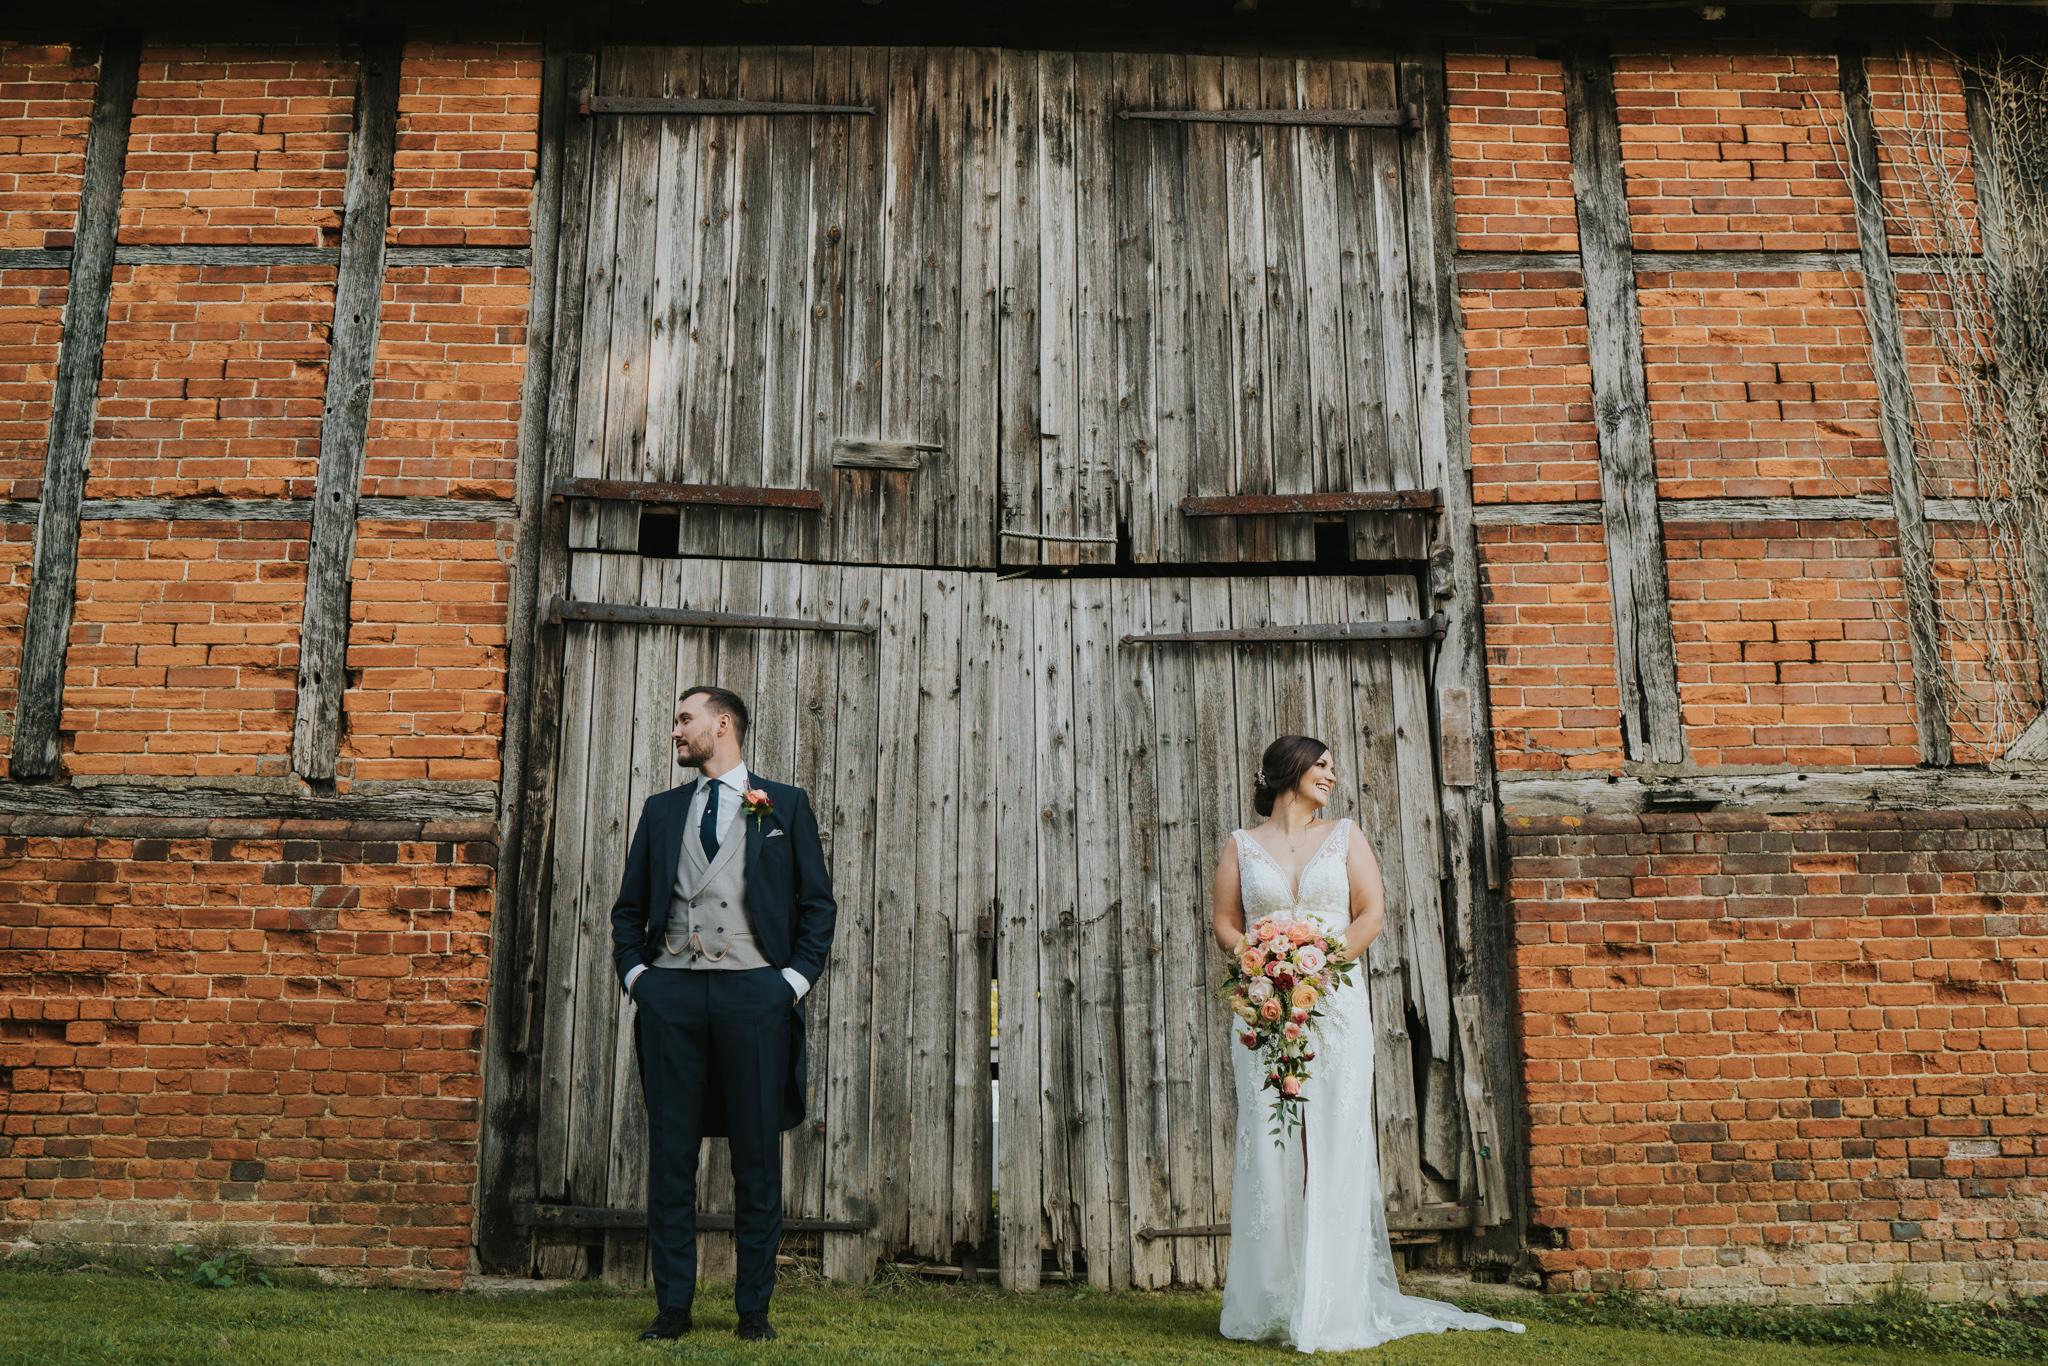 sophie-mark-newland-hall-boho-wedding-grace-elizanbeth-alternative-wedding-photographer-colchester-essex-norfolk-suffolk-devon+(139+of+161).jpg